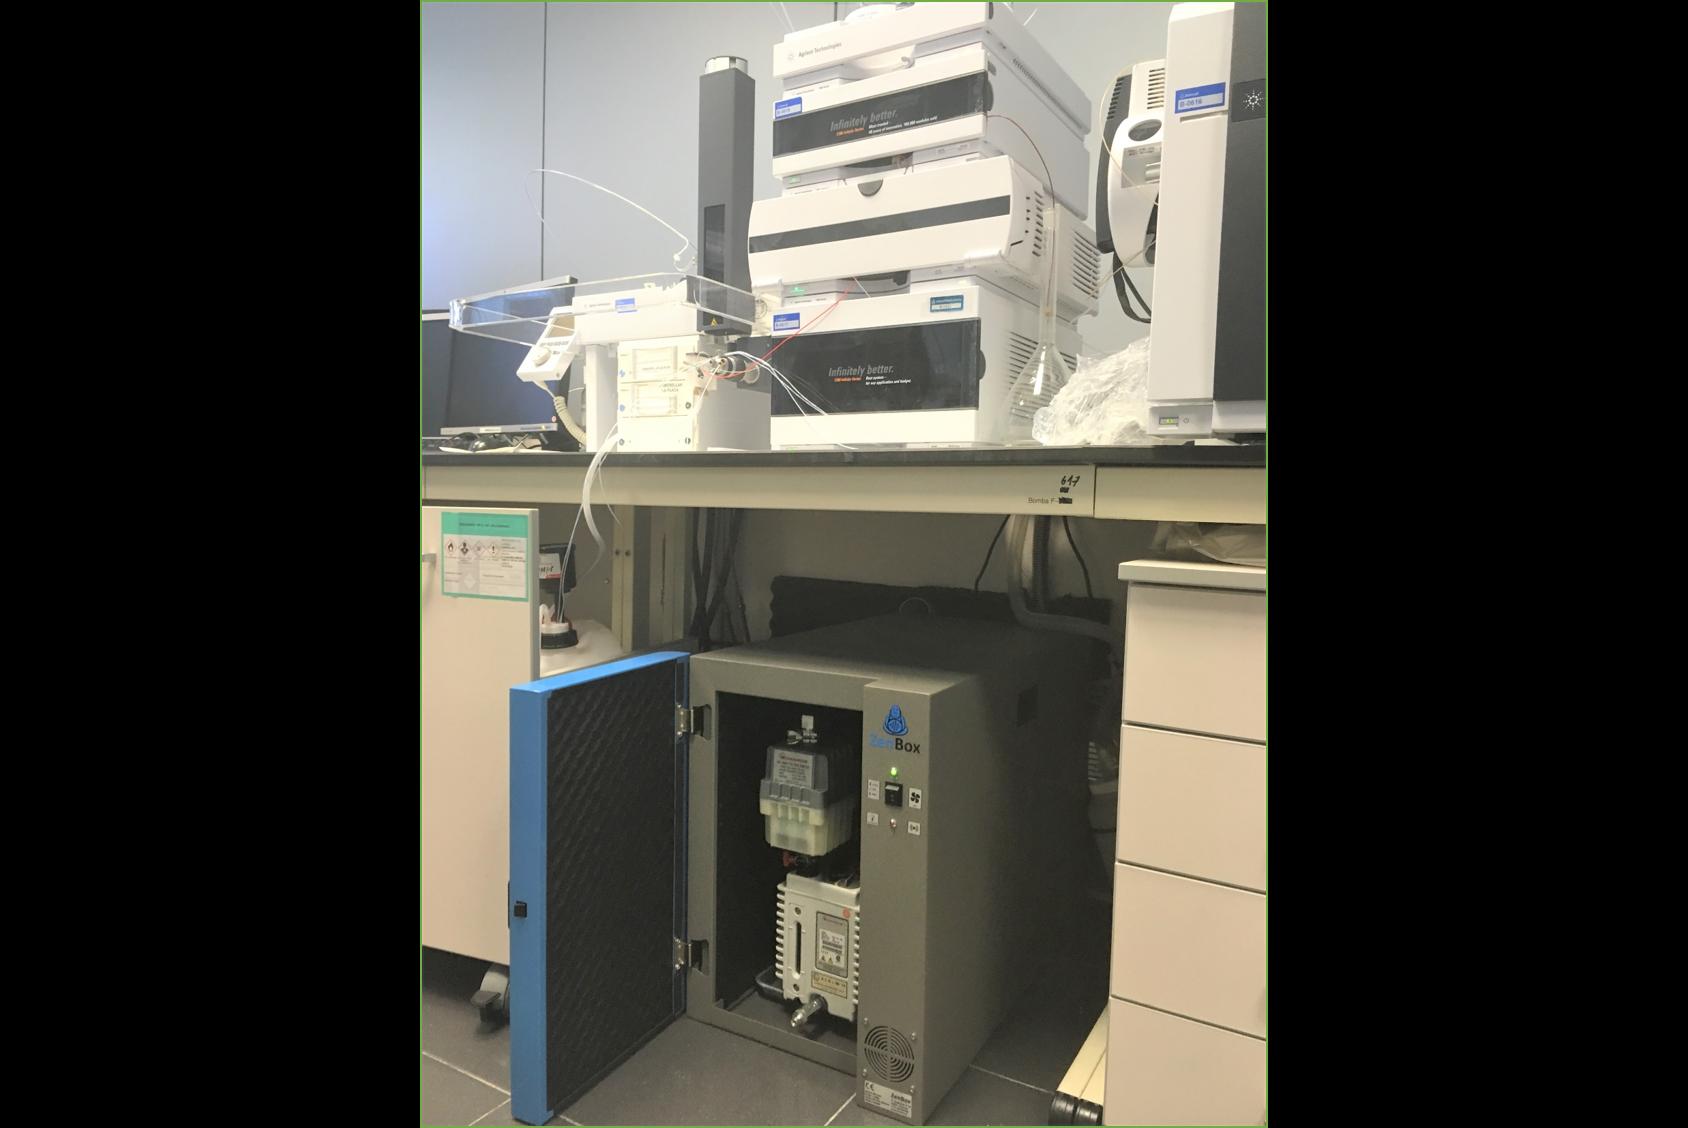 noise reduction enclosure for one boc edwards E2M28 rotary vane vacuum pump